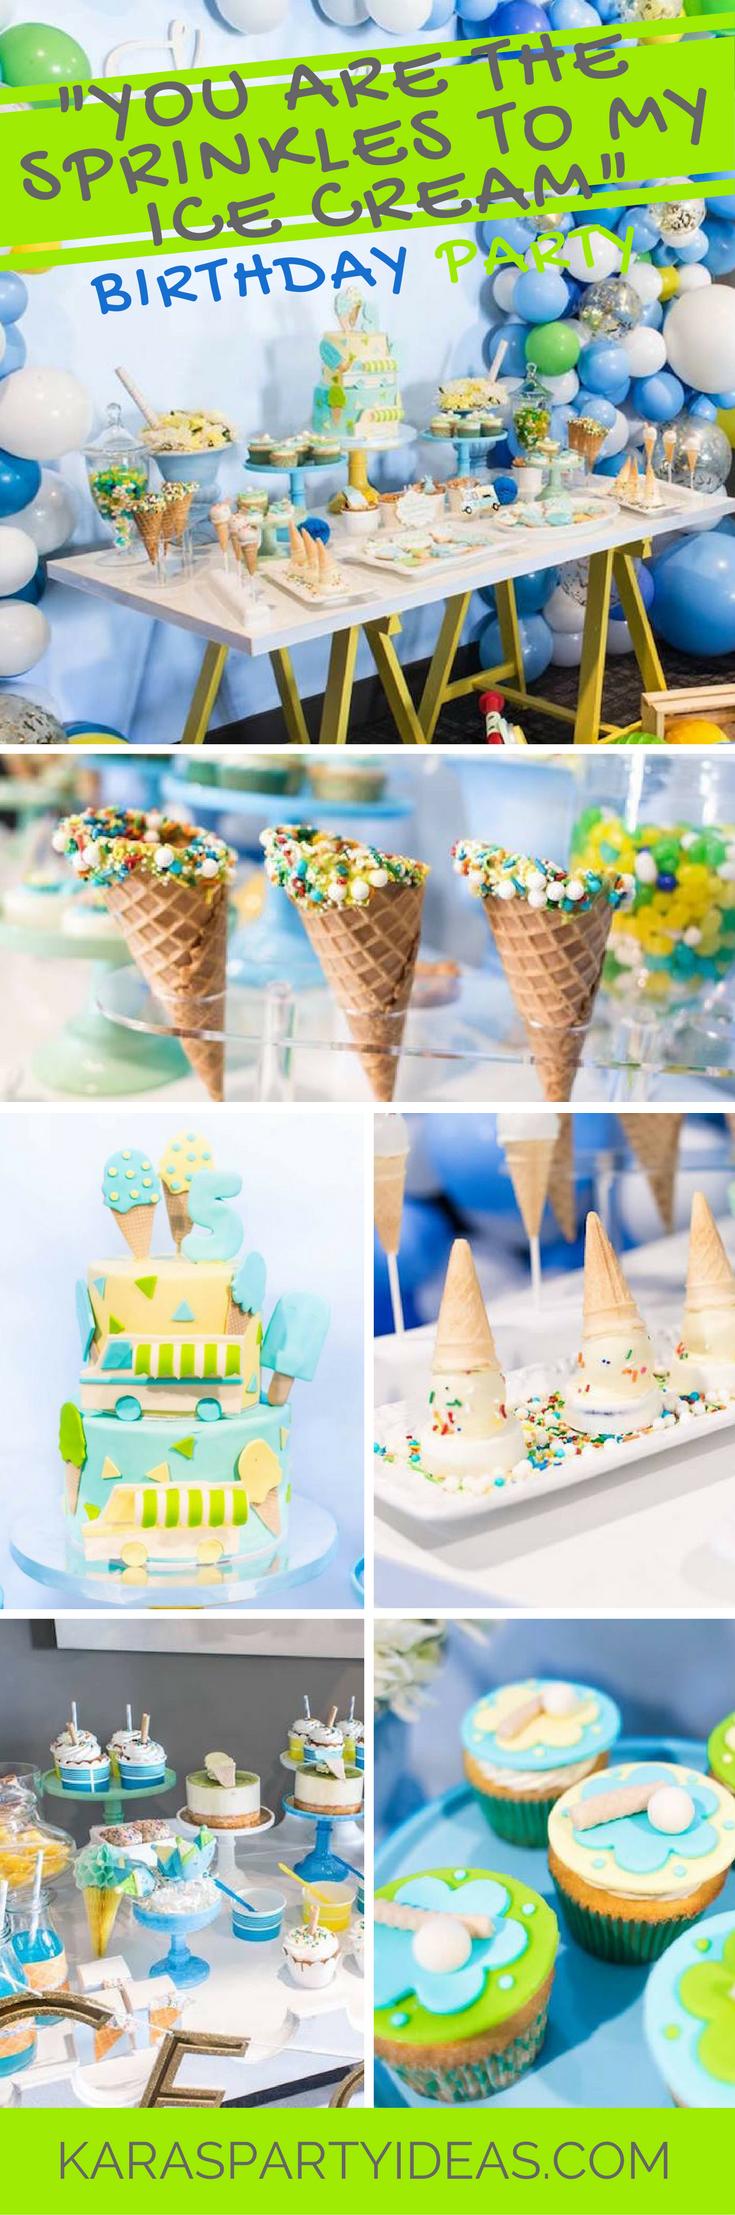 You are the Sprinkles to my Ice Cream Birthday Party via Kara's Party Ideas - KarasPartyIdeas.com